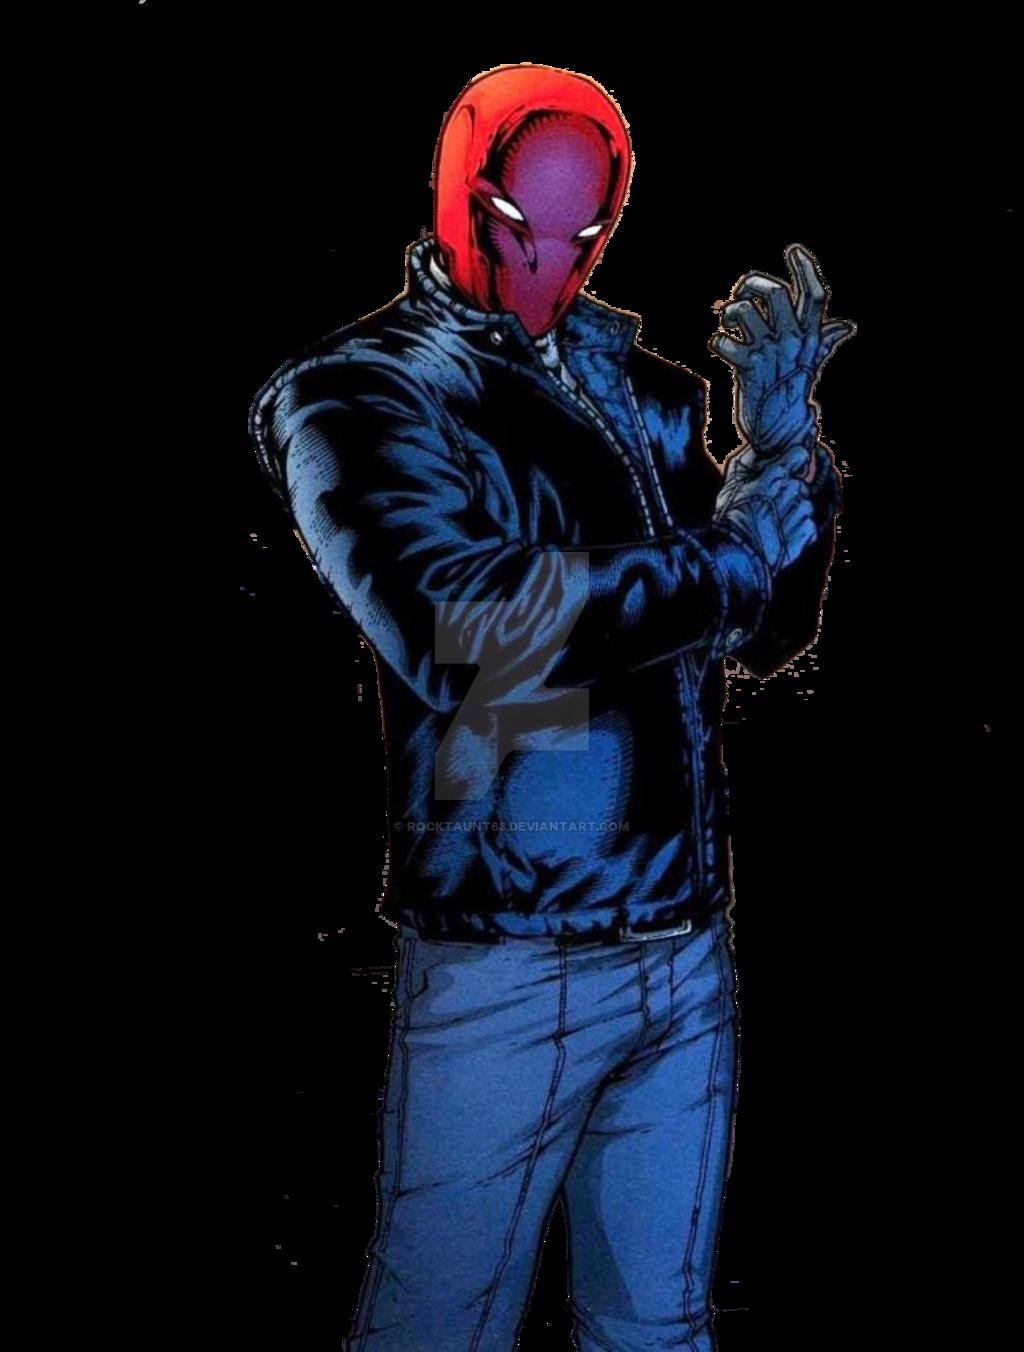 Red Hood (Jason Todd).